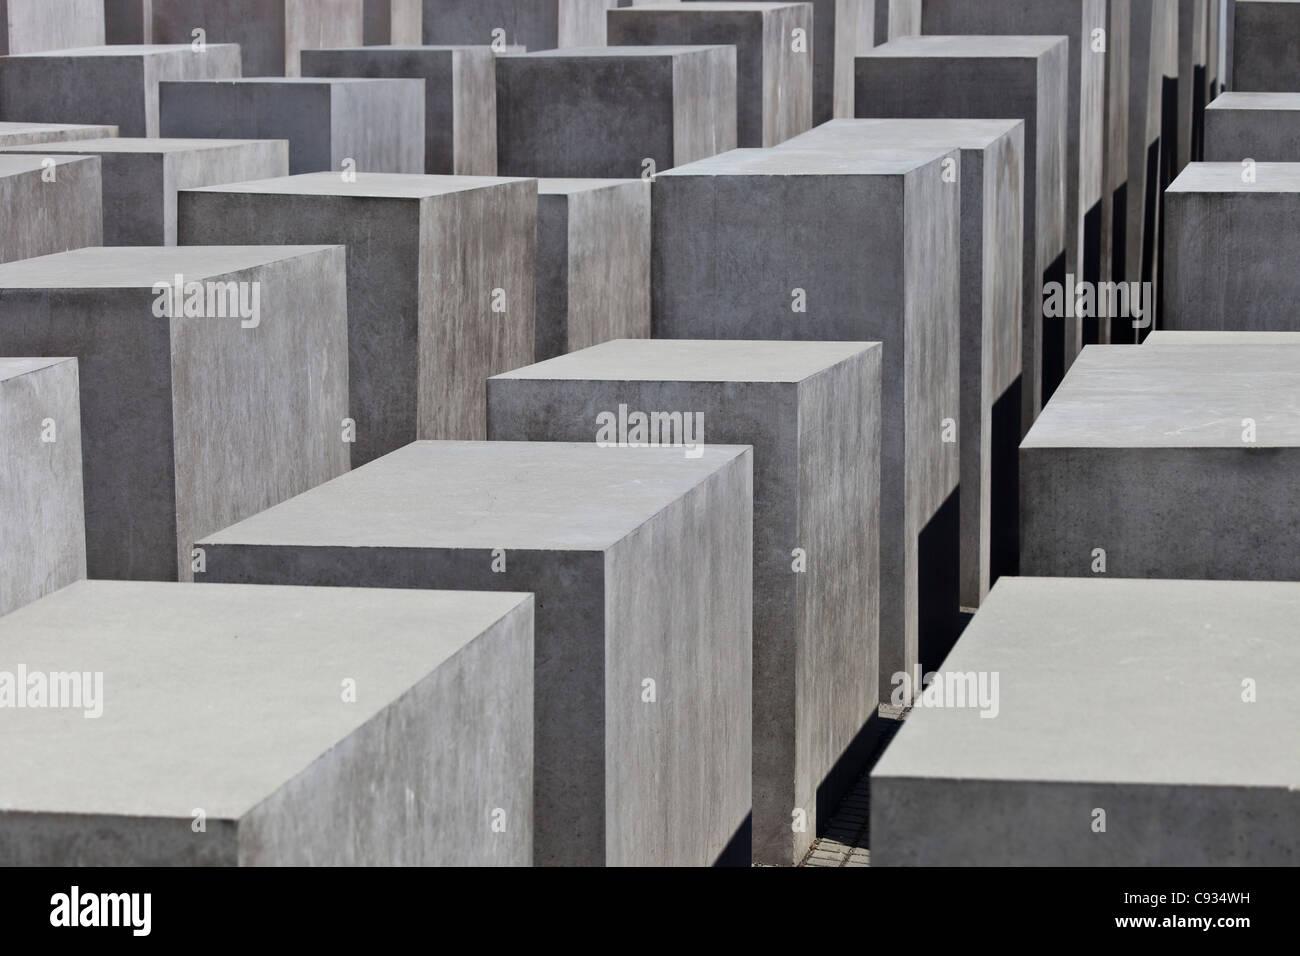 Concrete blocks of the Holocaust Memorial to the Murdered Jews of Europe, Potsdamer Platz, Berlin, Germany. - Stock Image